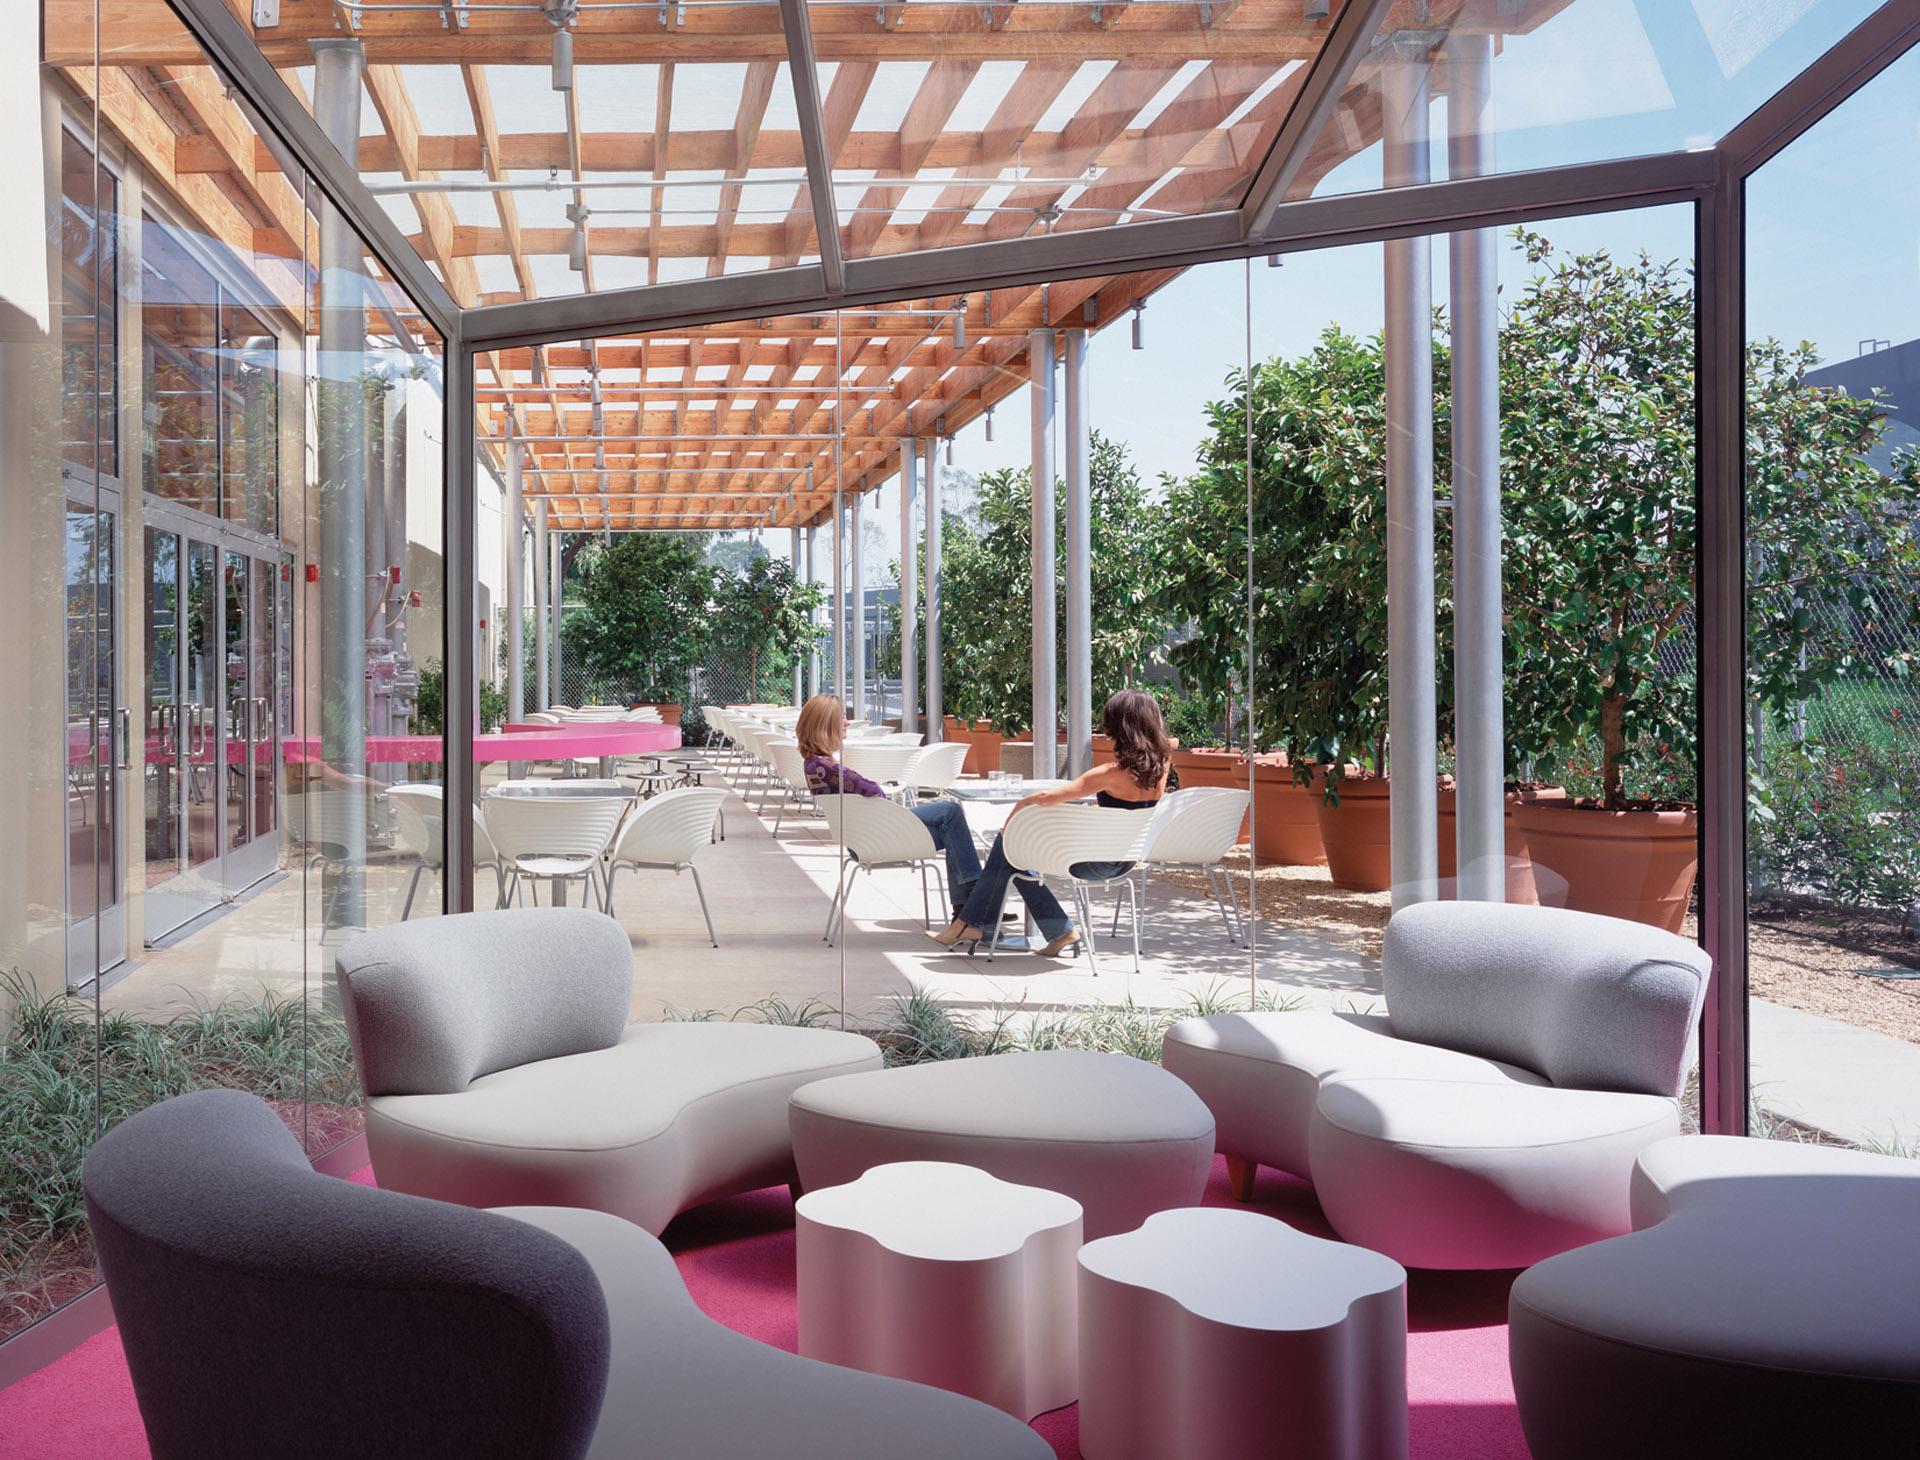 Clive Wilkinson Architects Fidm Orange County